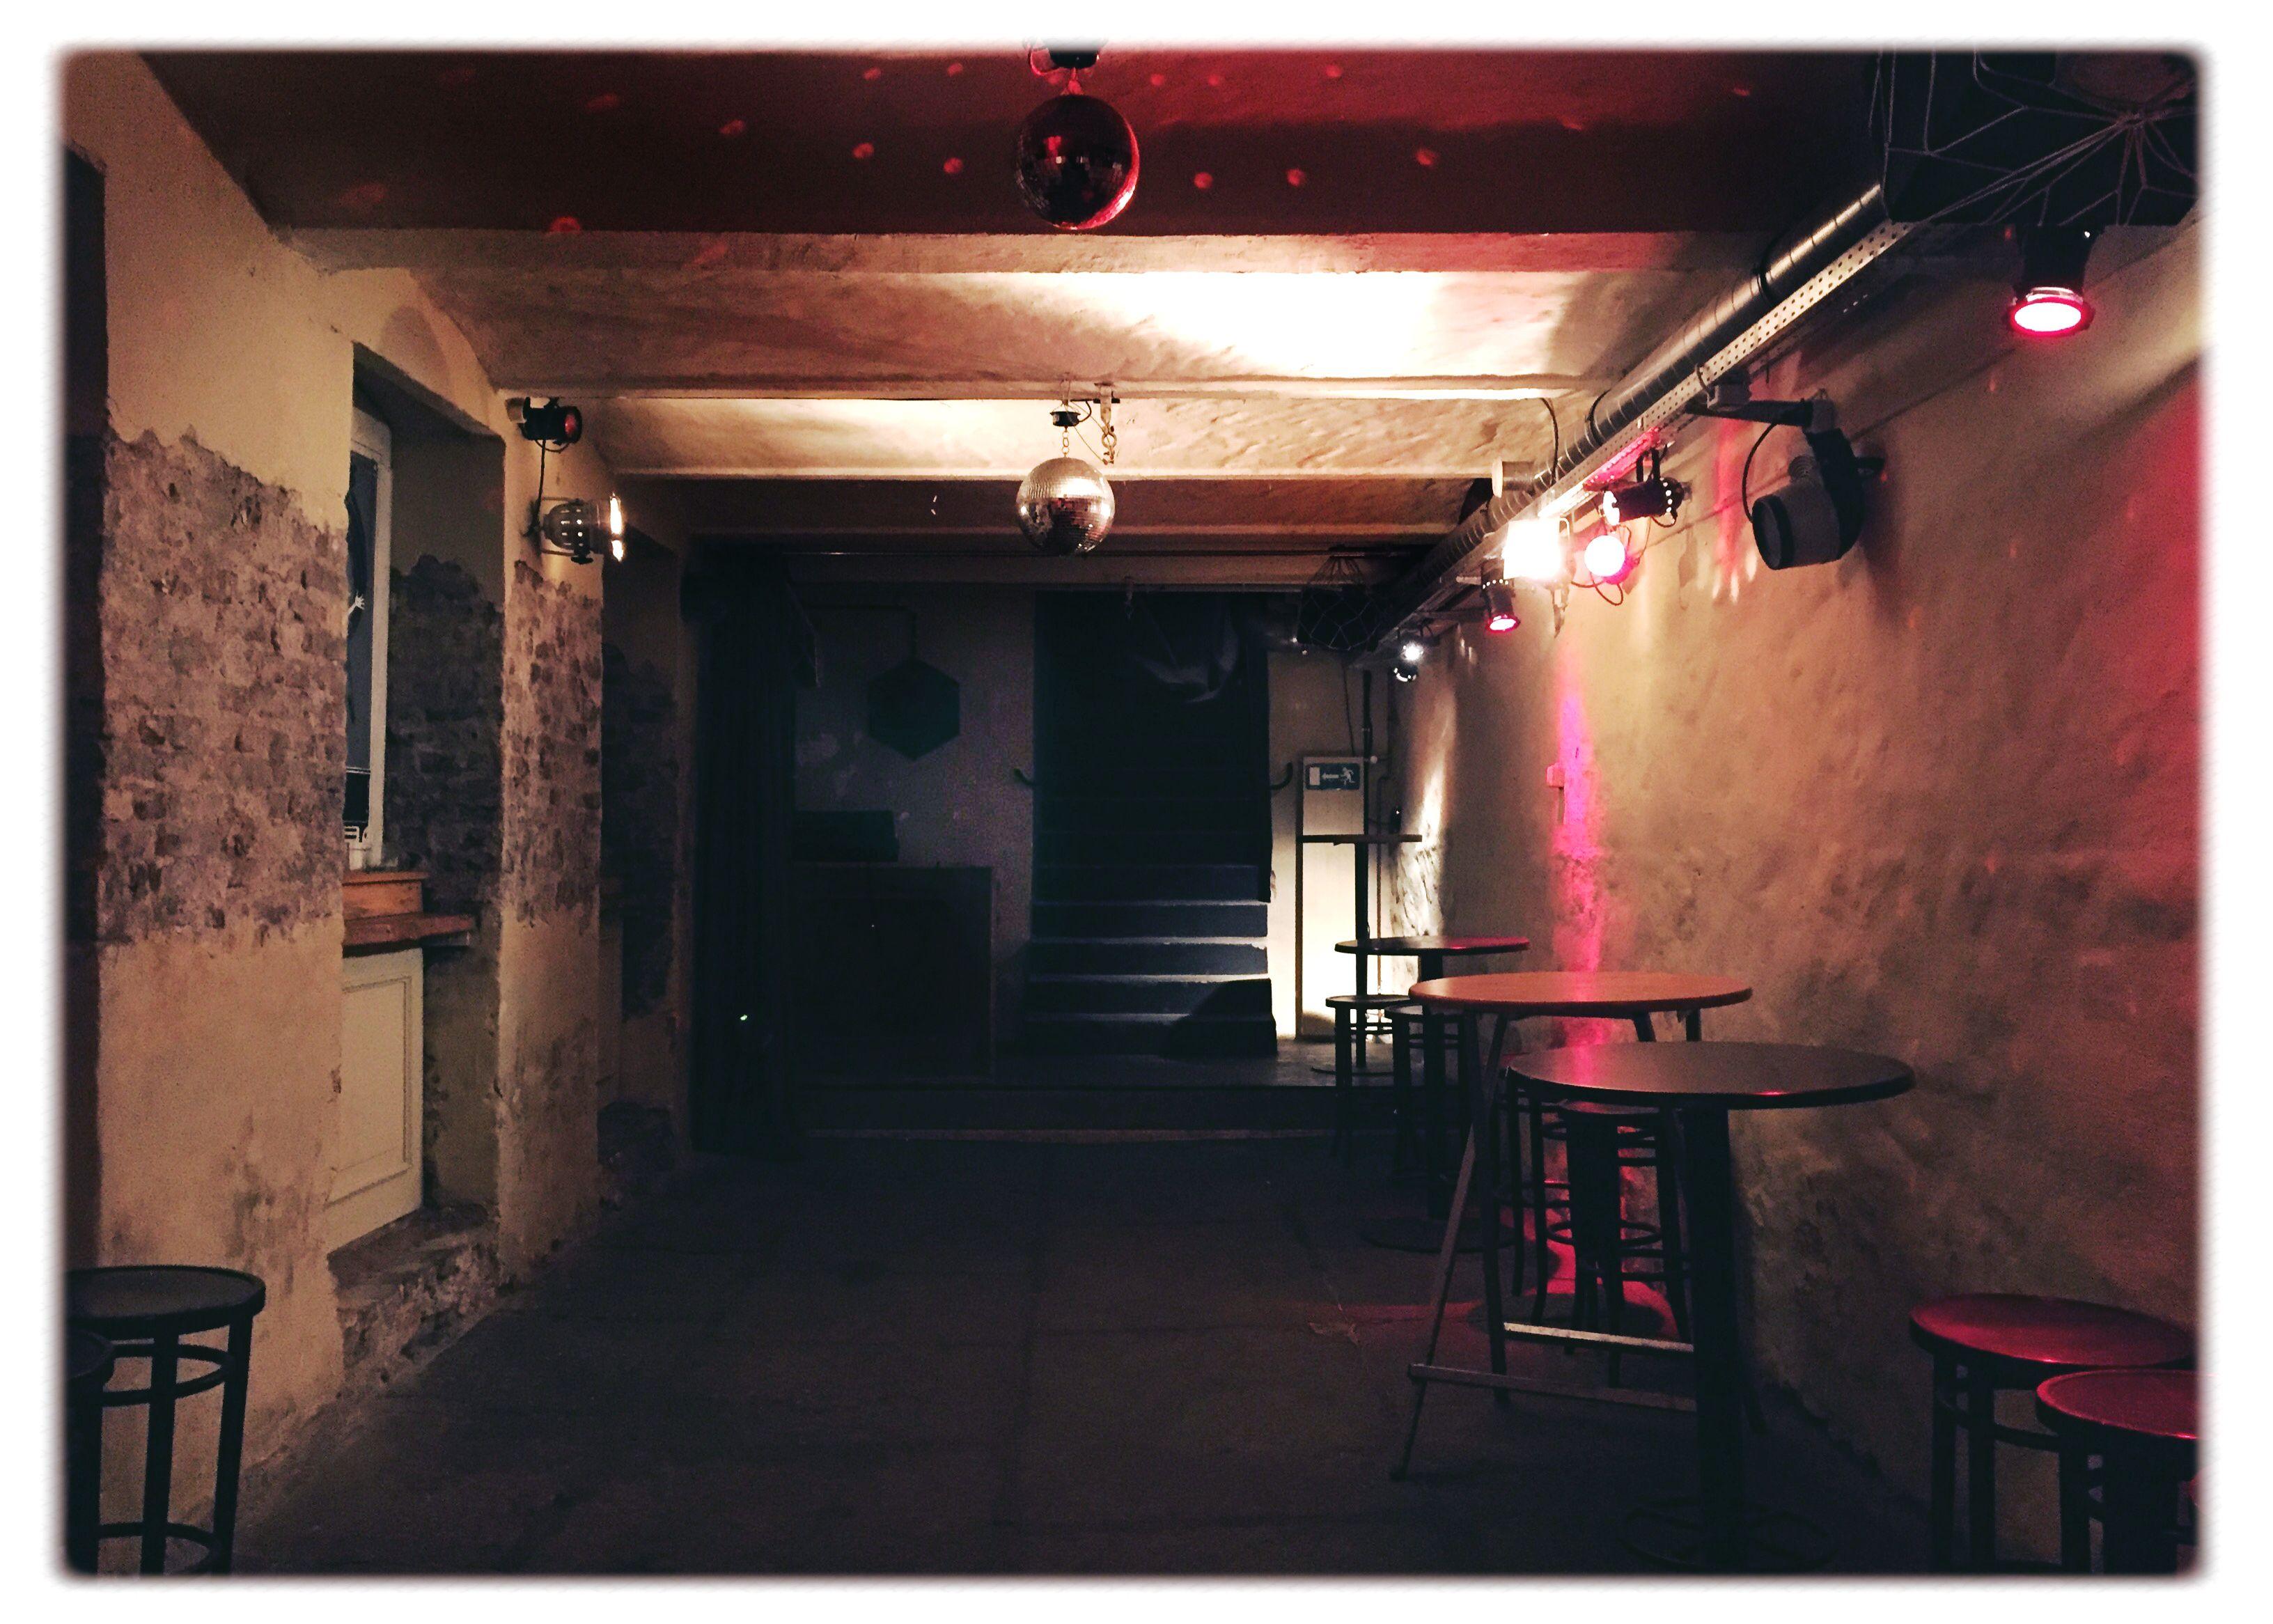 raum mieten berlin party feiern hackendahl. Black Bedroom Furniture Sets. Home Design Ideas